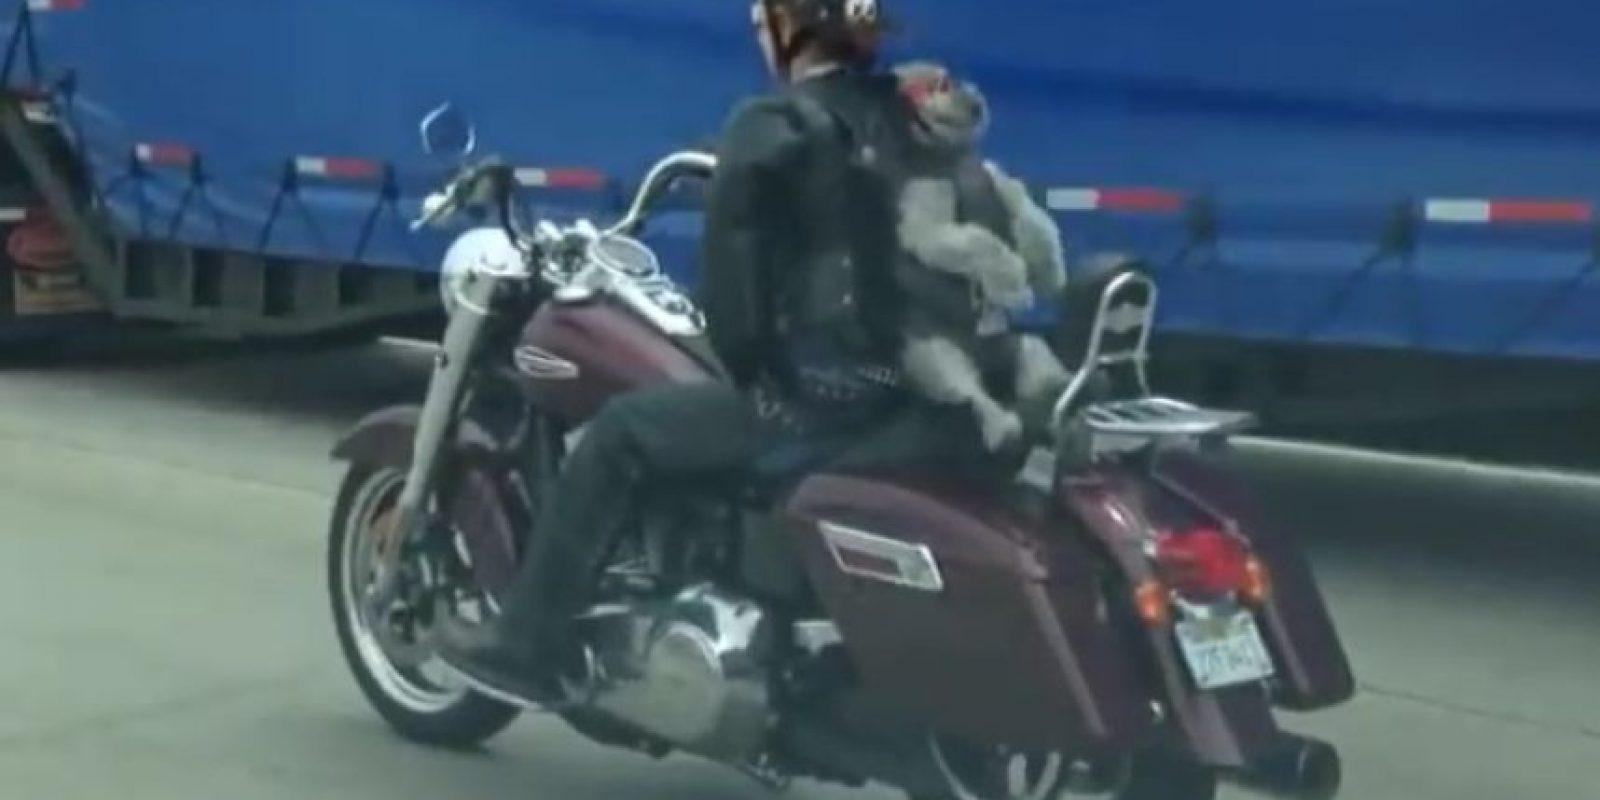 Sentado sobre la moto de su dueña Foto:Vïa Youtube/Shawn White